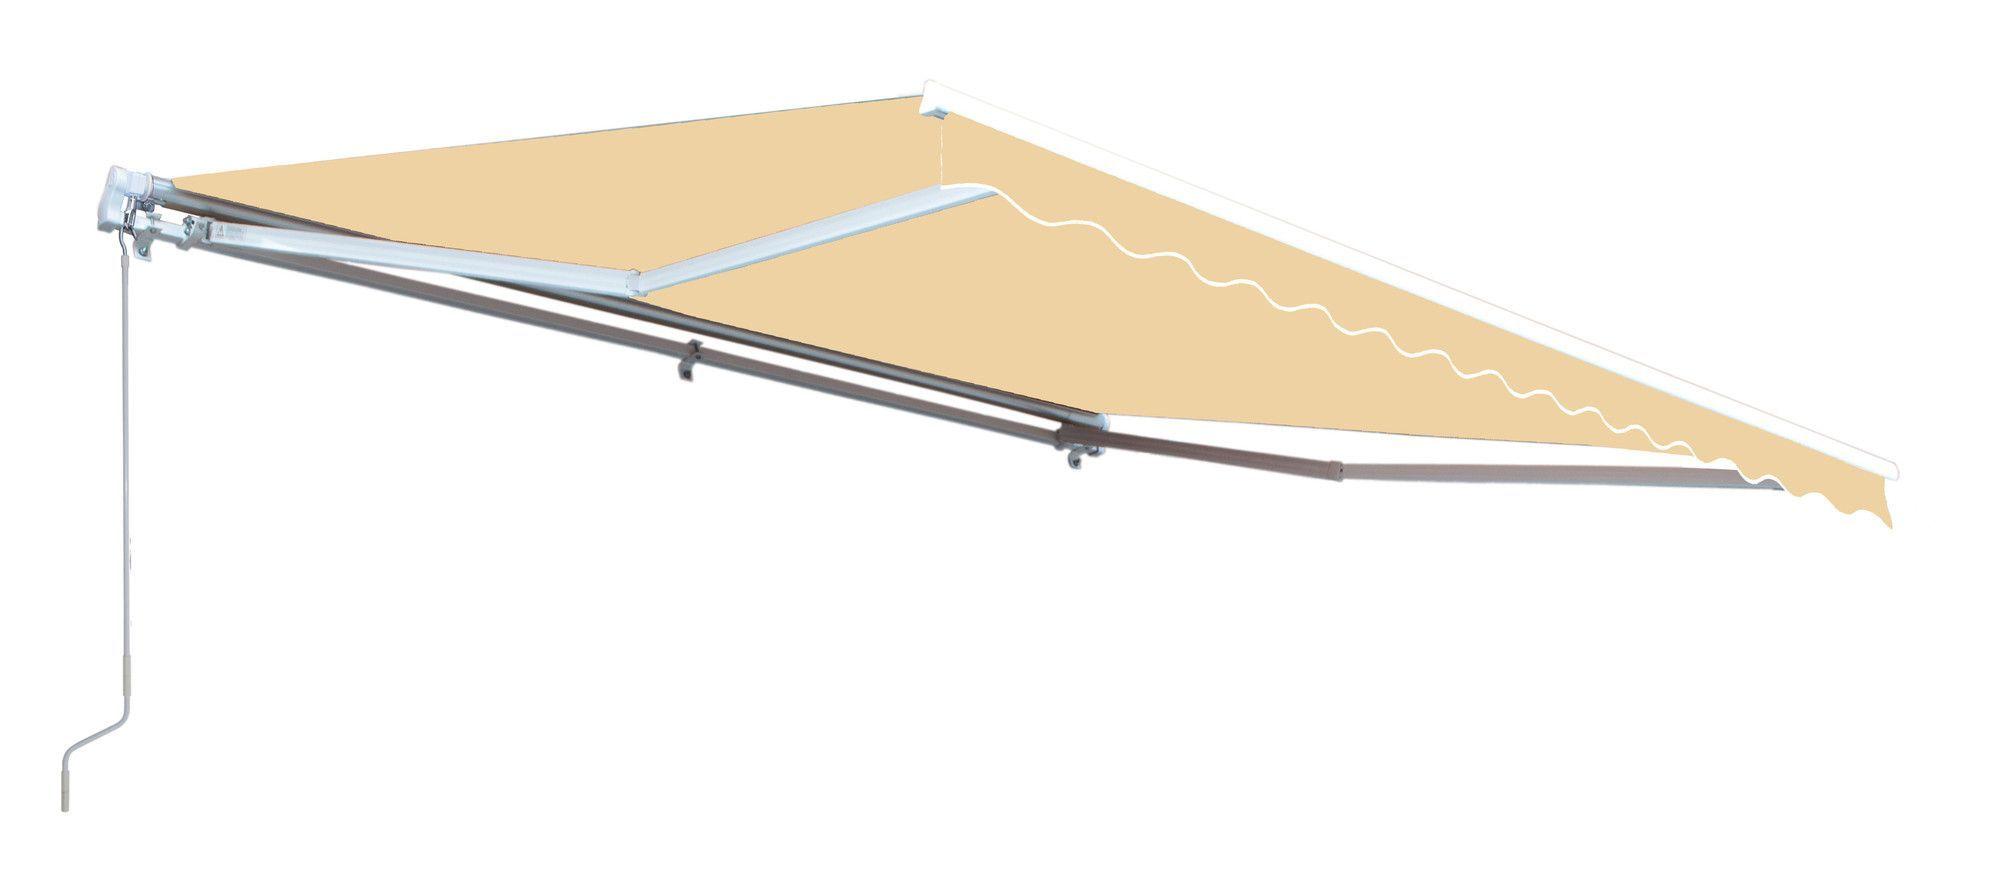 10 Ft W X 8 Ft D Fabric Retractable Standard Patio Awning Pergola Ideas For Patio Pergola Patio Backyard Pergola